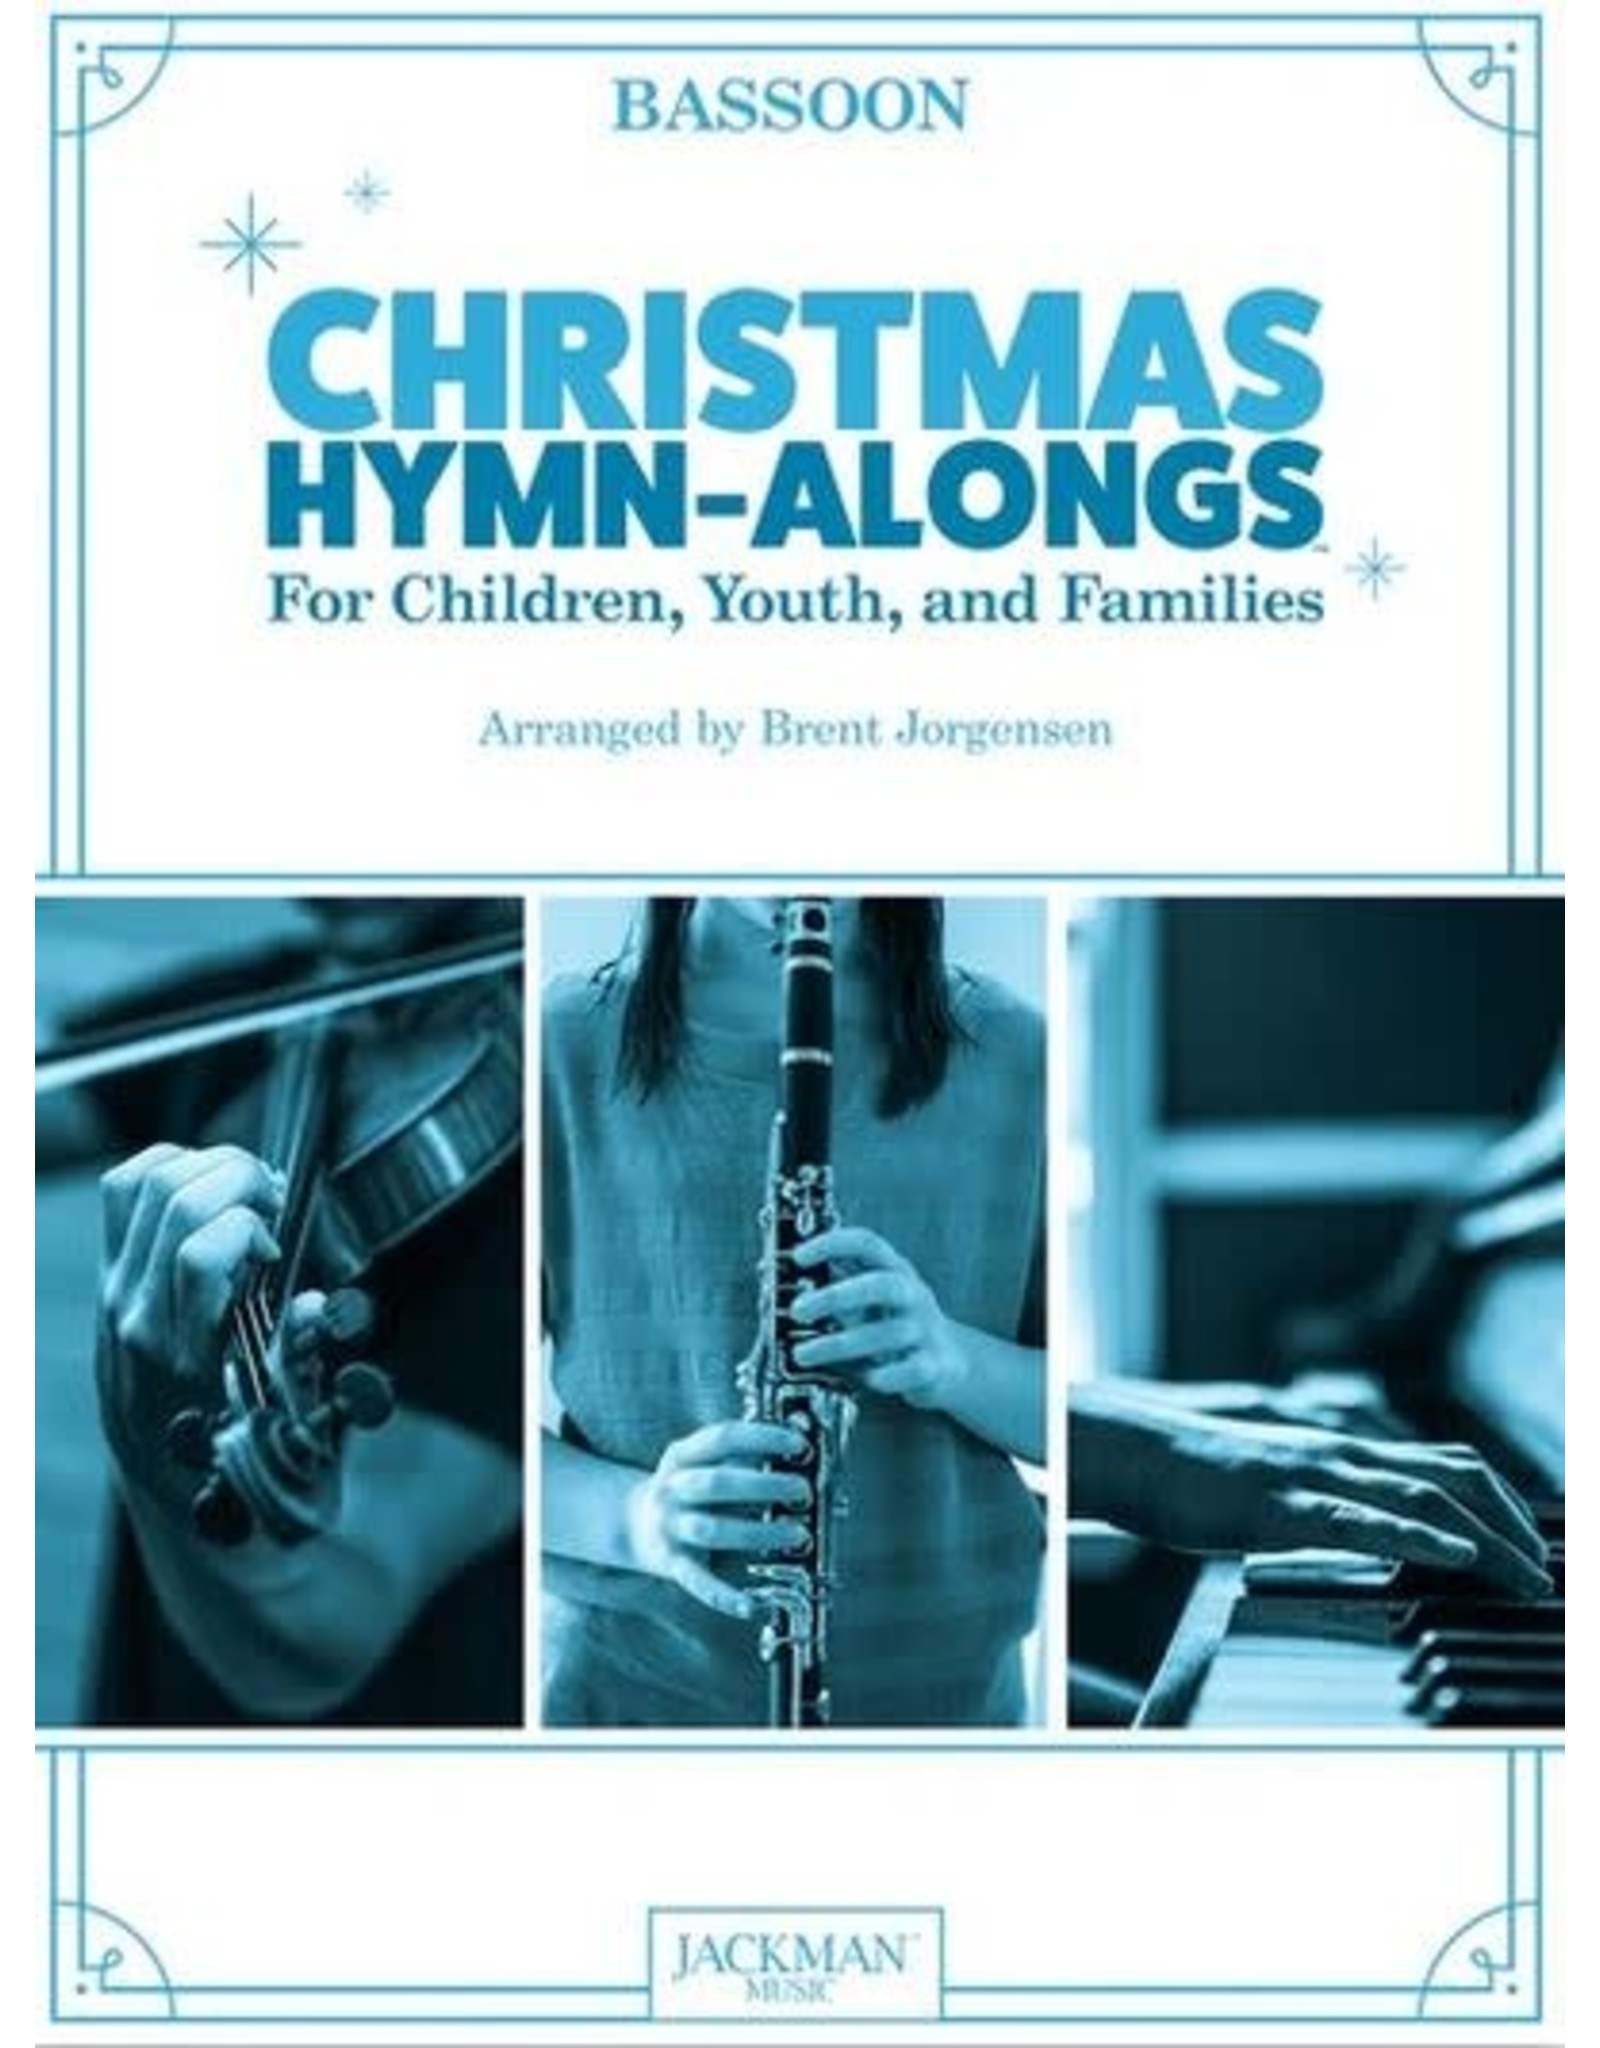 Jackman Music Christmas Hymn-Alongs - arr. Brent Jorgensen - Bassoon